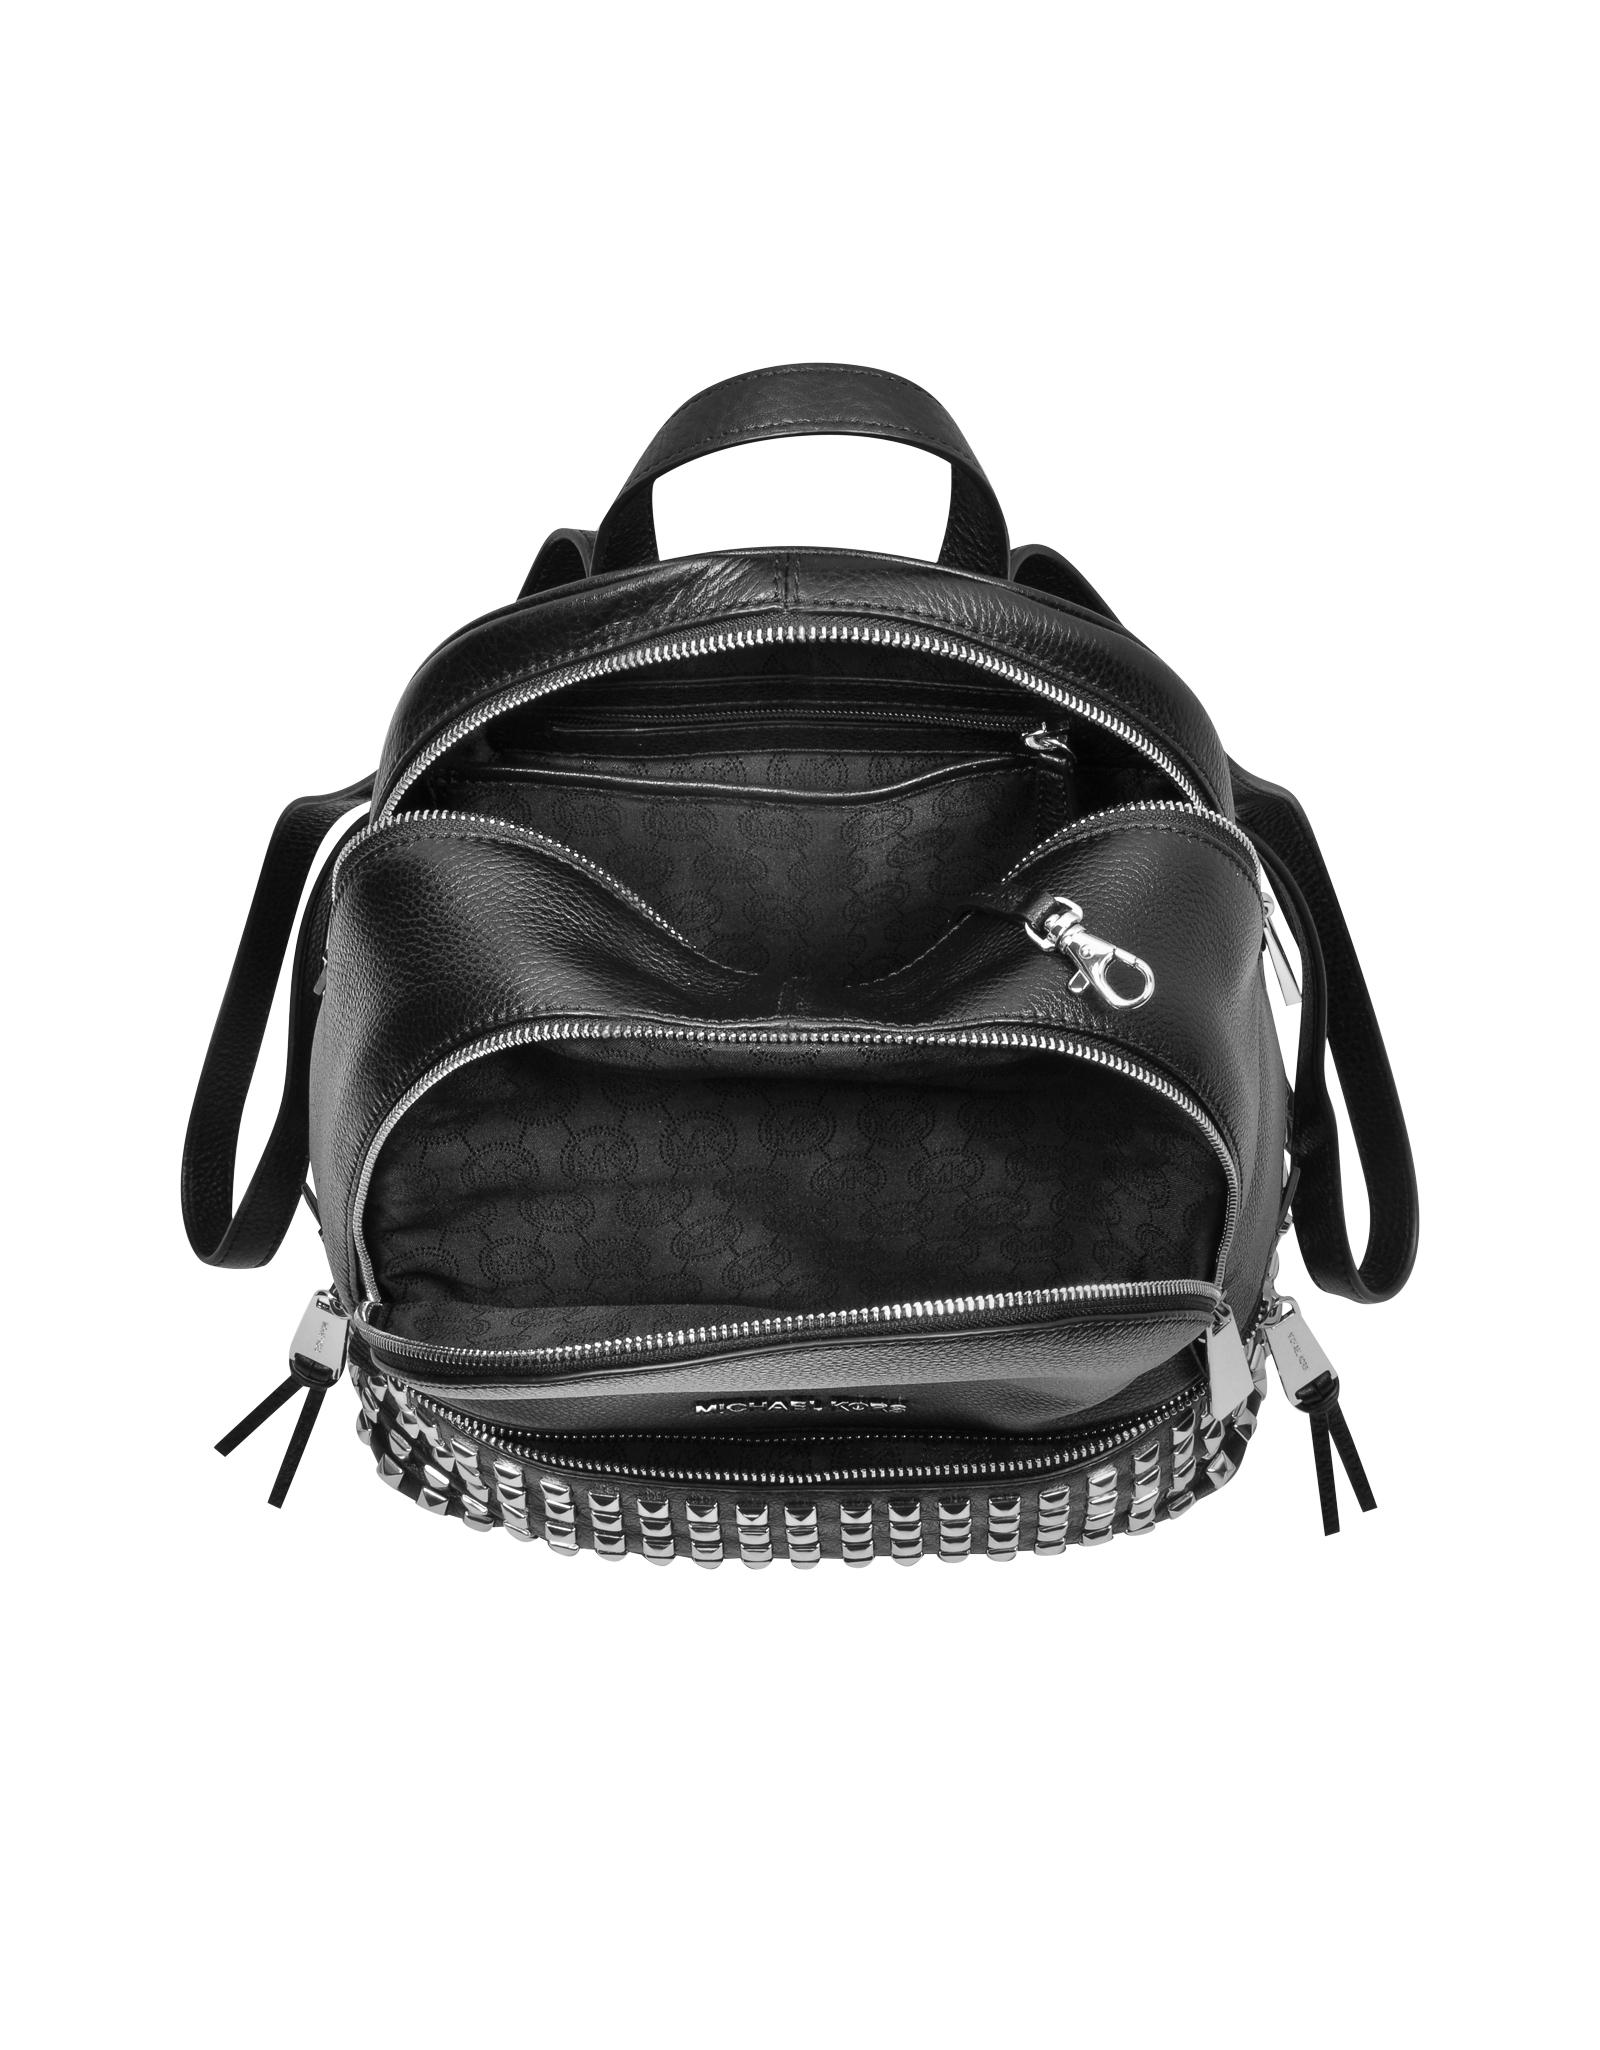 40aa94c1b4 Lyst - Michael Kors Rhea Zip Small Studded Leather Backpack in Metallic